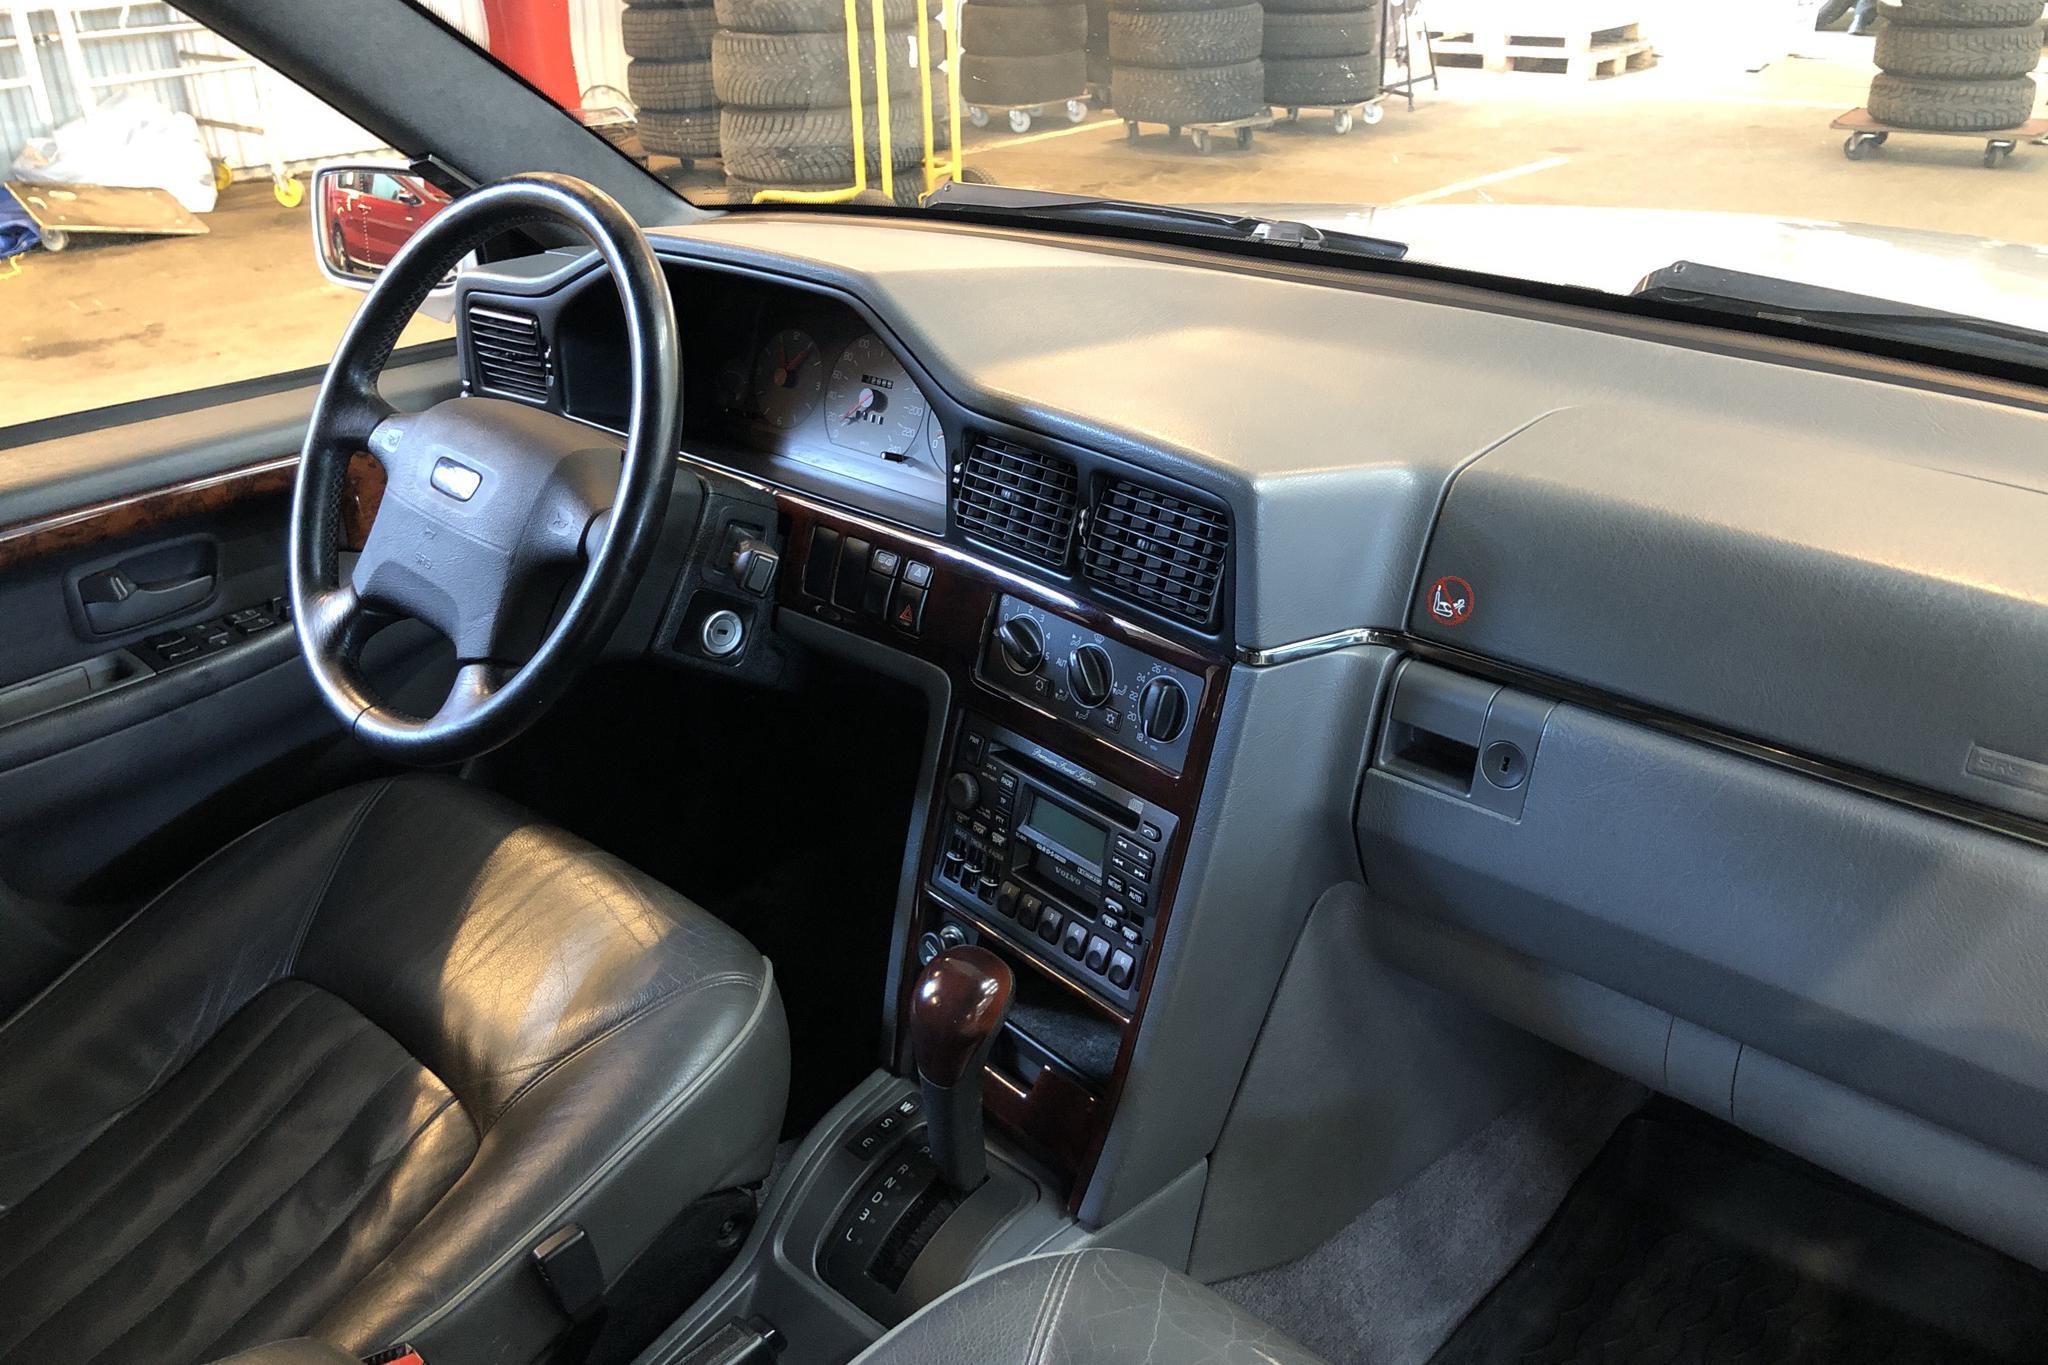 Volvo 965 2.5 (170hk) - 220 840 km - Automatic - Light Grey - 1997